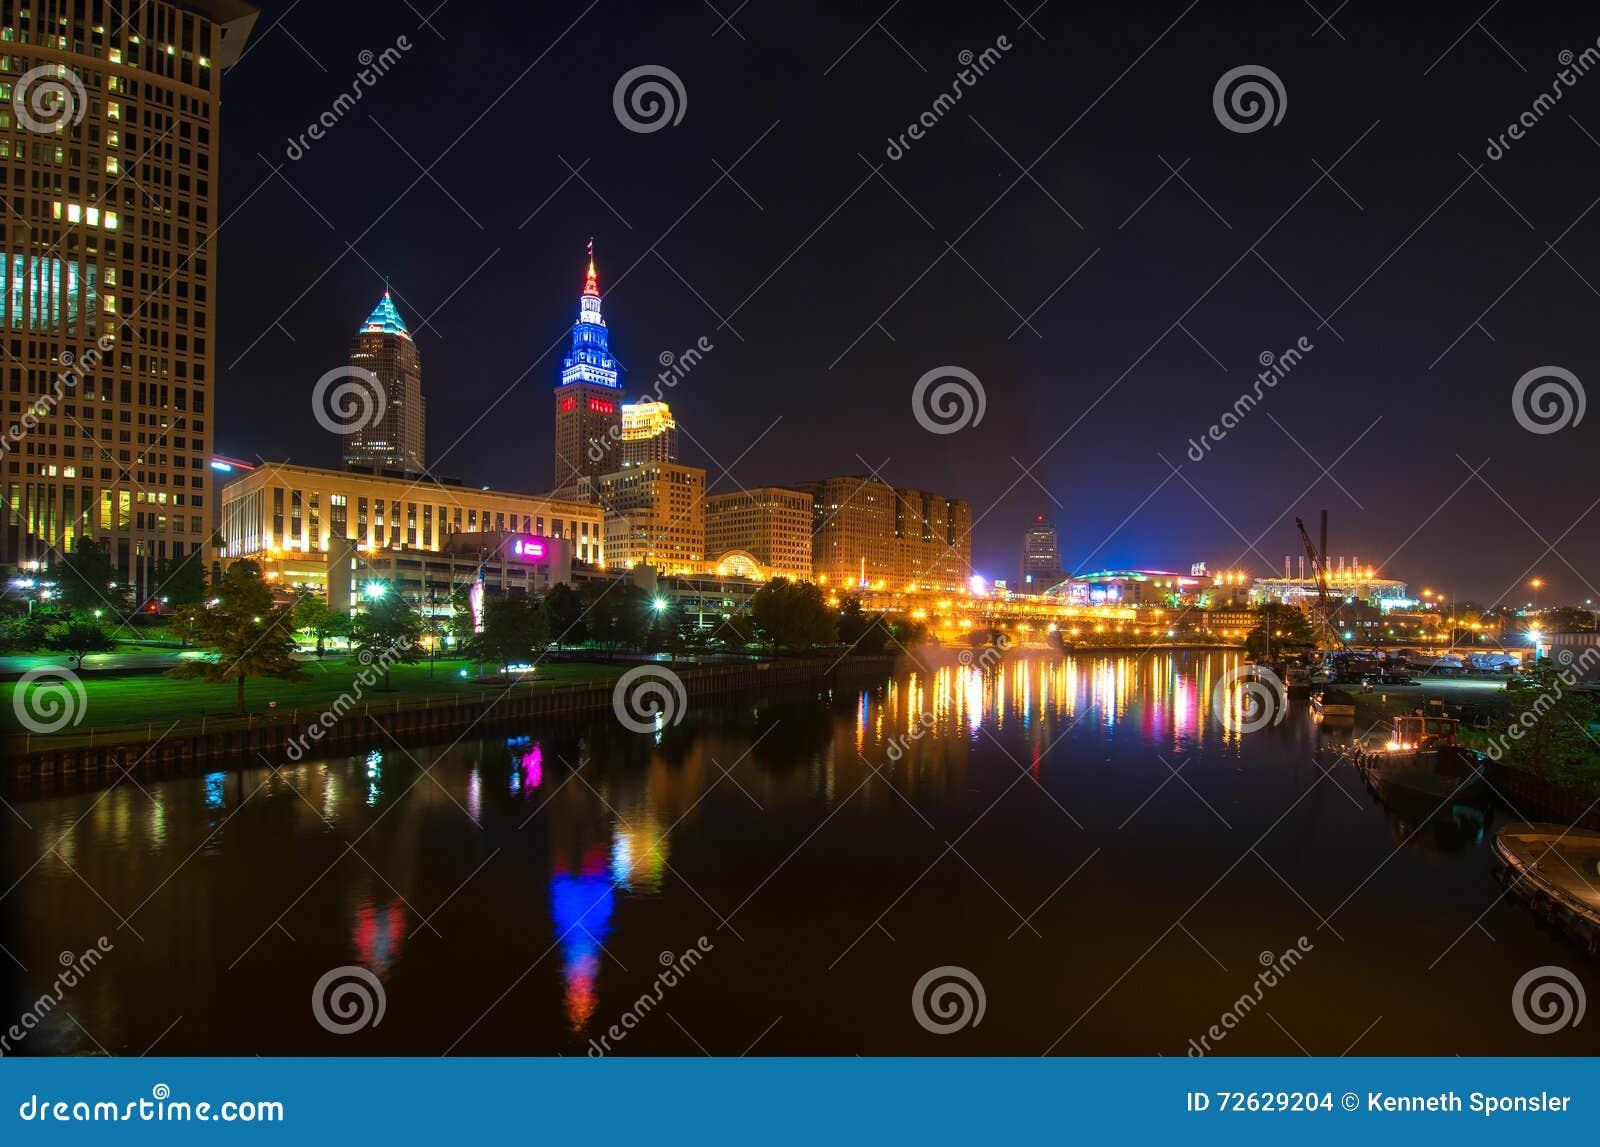 Cleveland aglow